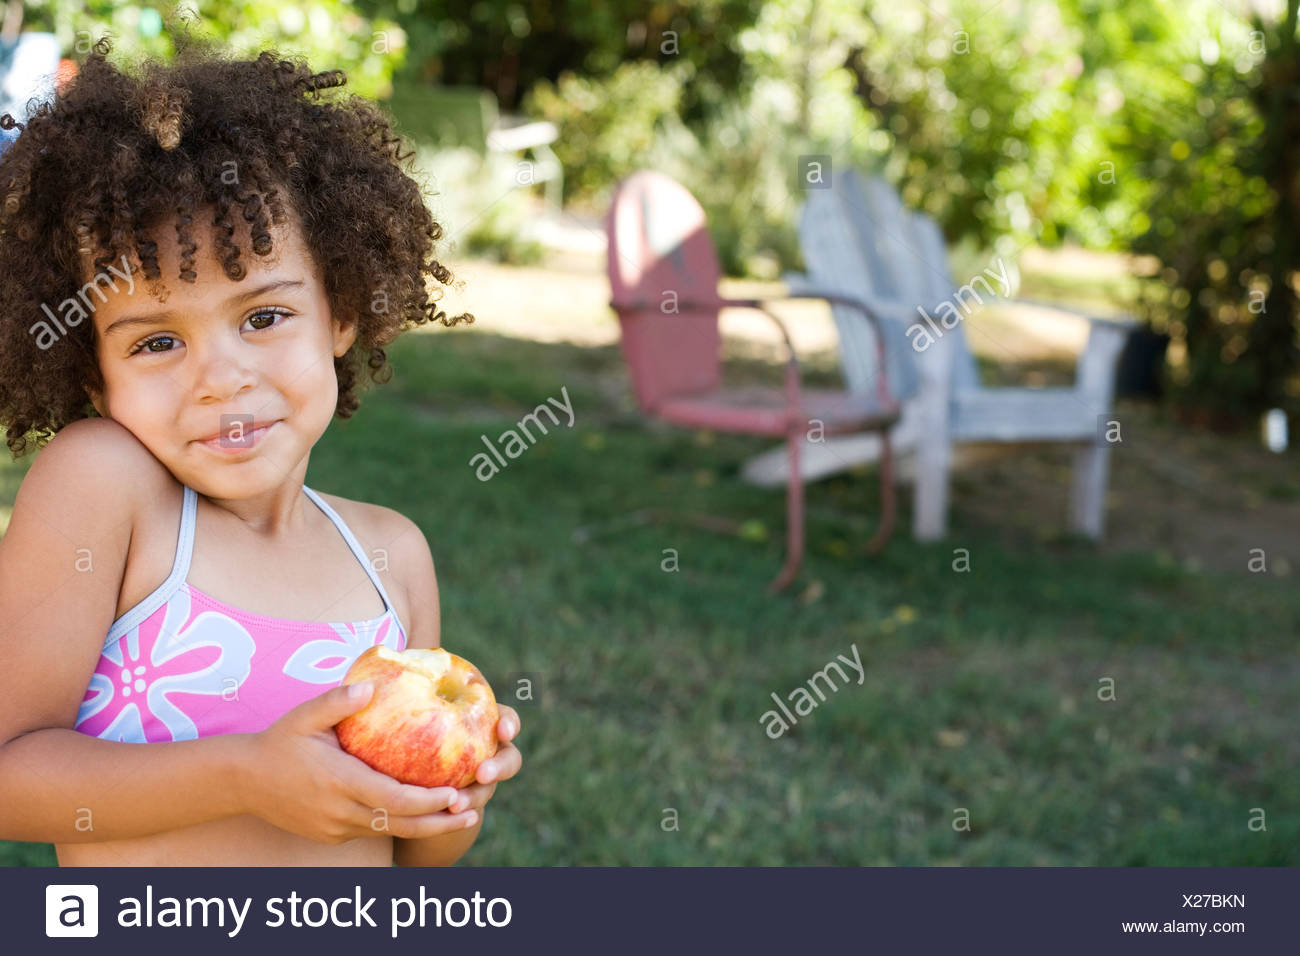 Girl in swimwear holding apple in yard - Stock Image